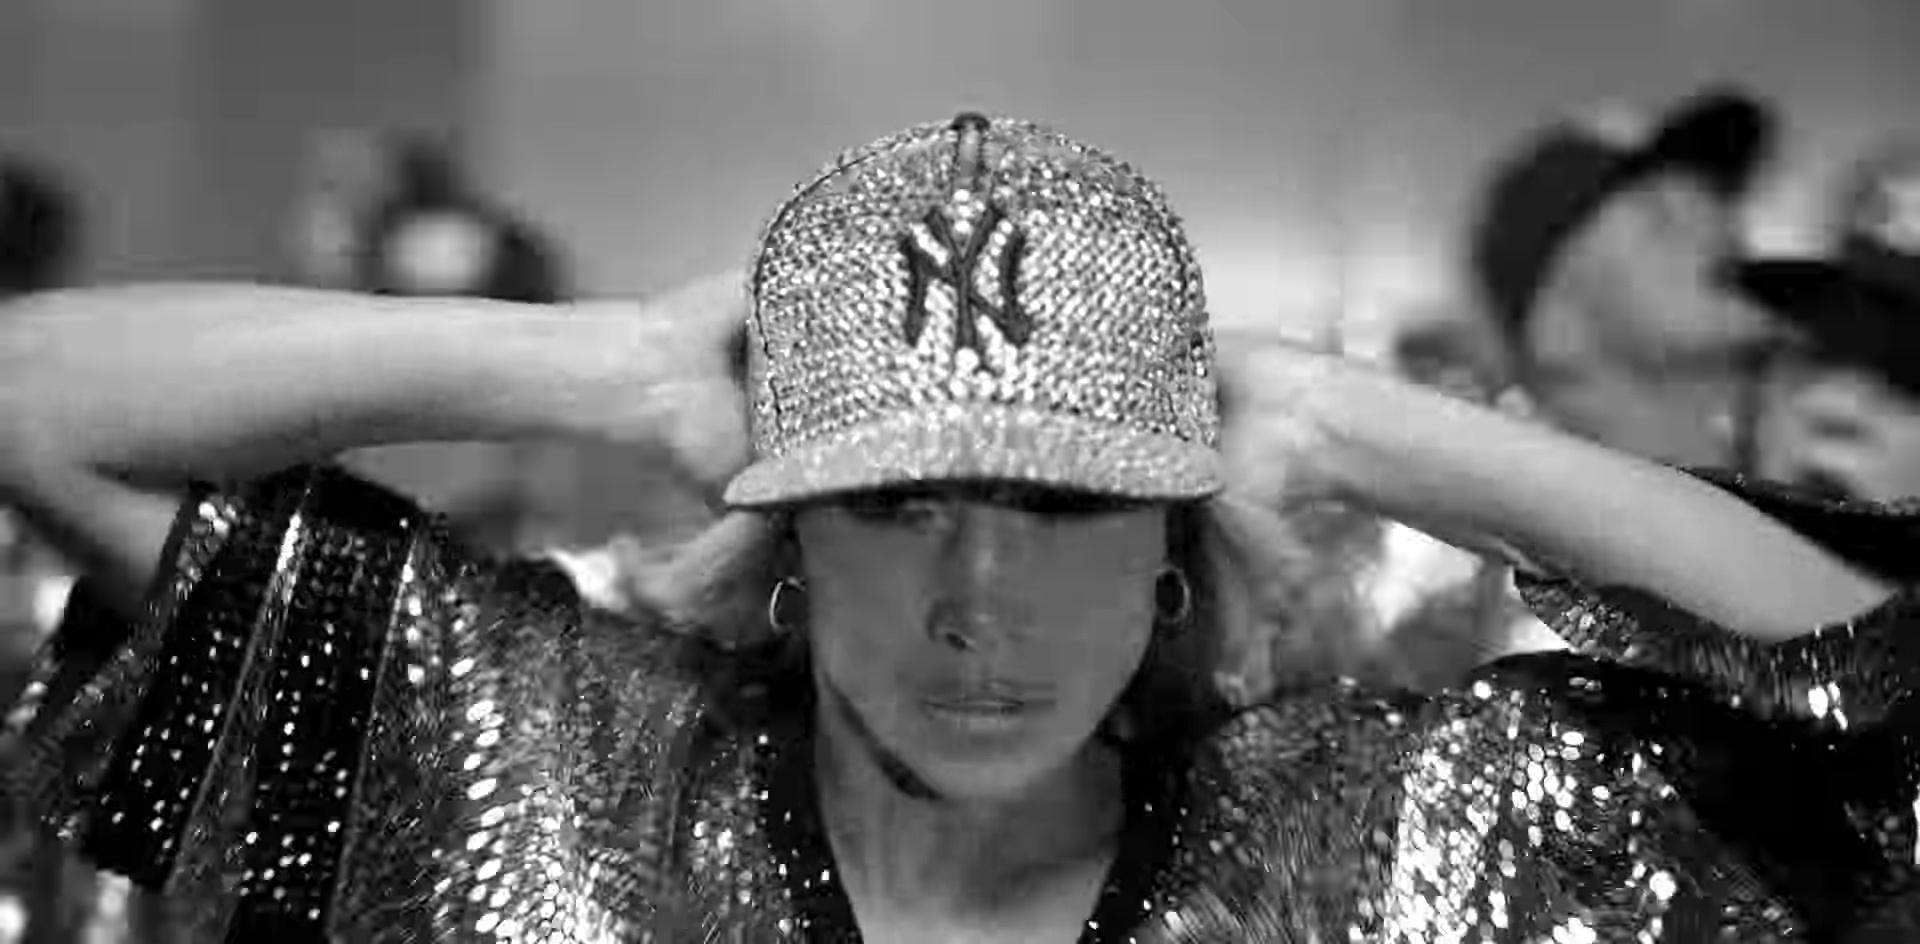 Sequin New York Yankees Cap Worn By Jennifer Lopez In